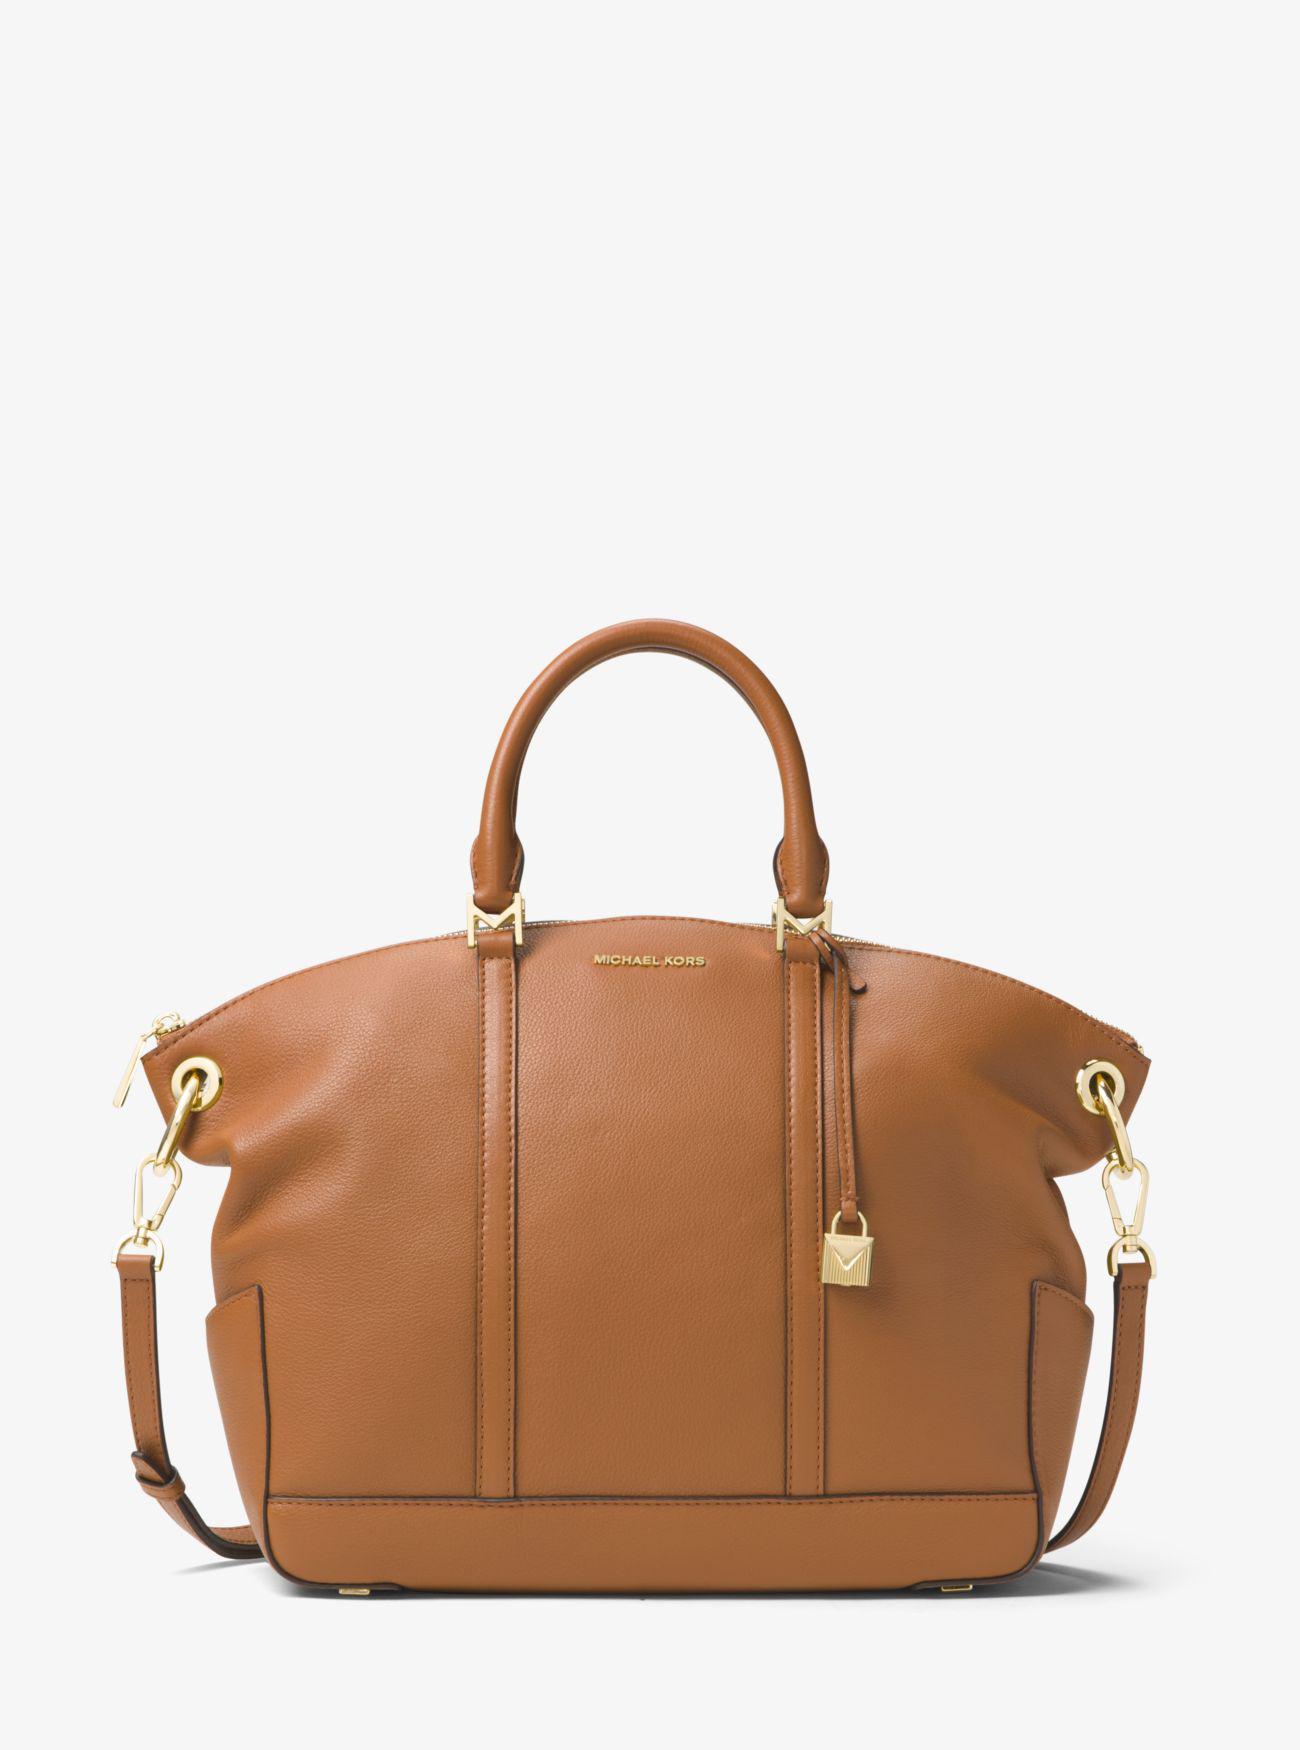 52ef6ddb3ed615 ... Bedford Handbag Black Women Michael Kors - Large Saffiano Leather  Hamilton Satchel Michael kors Beckett Large Leather Satchel in Brown Lyst  ...